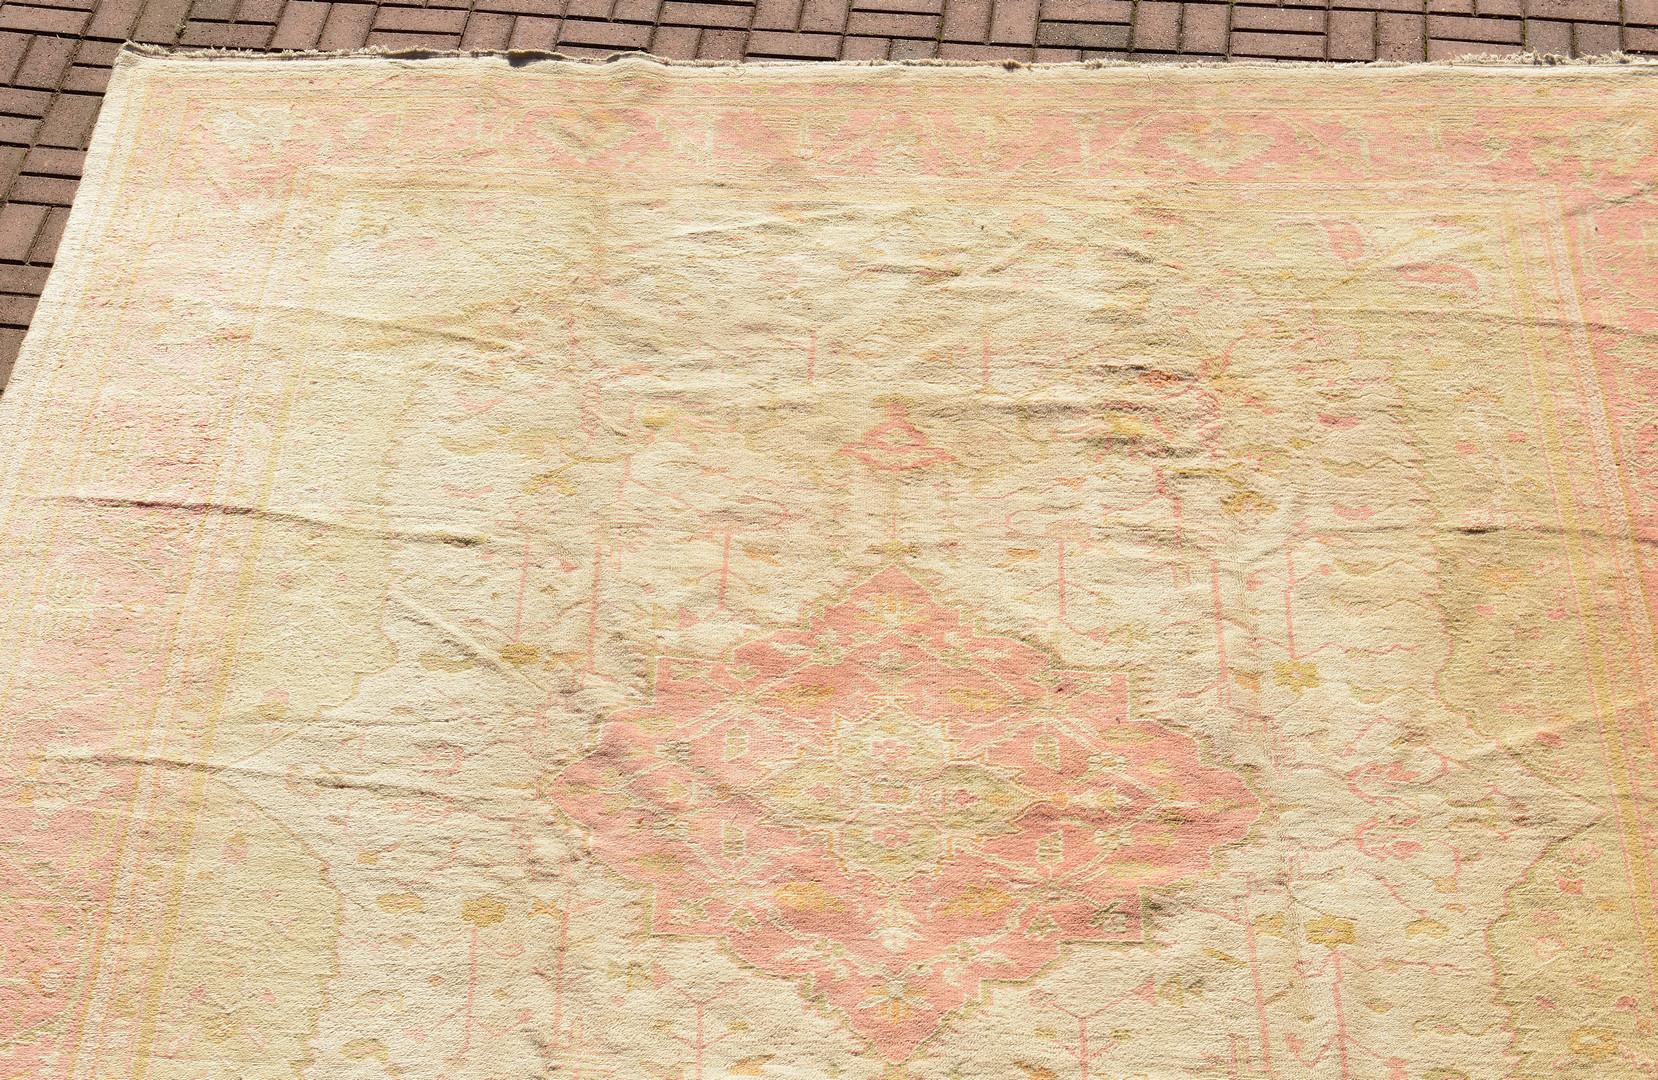 Lot 819: 11 x 15 Oushak Persian Rug